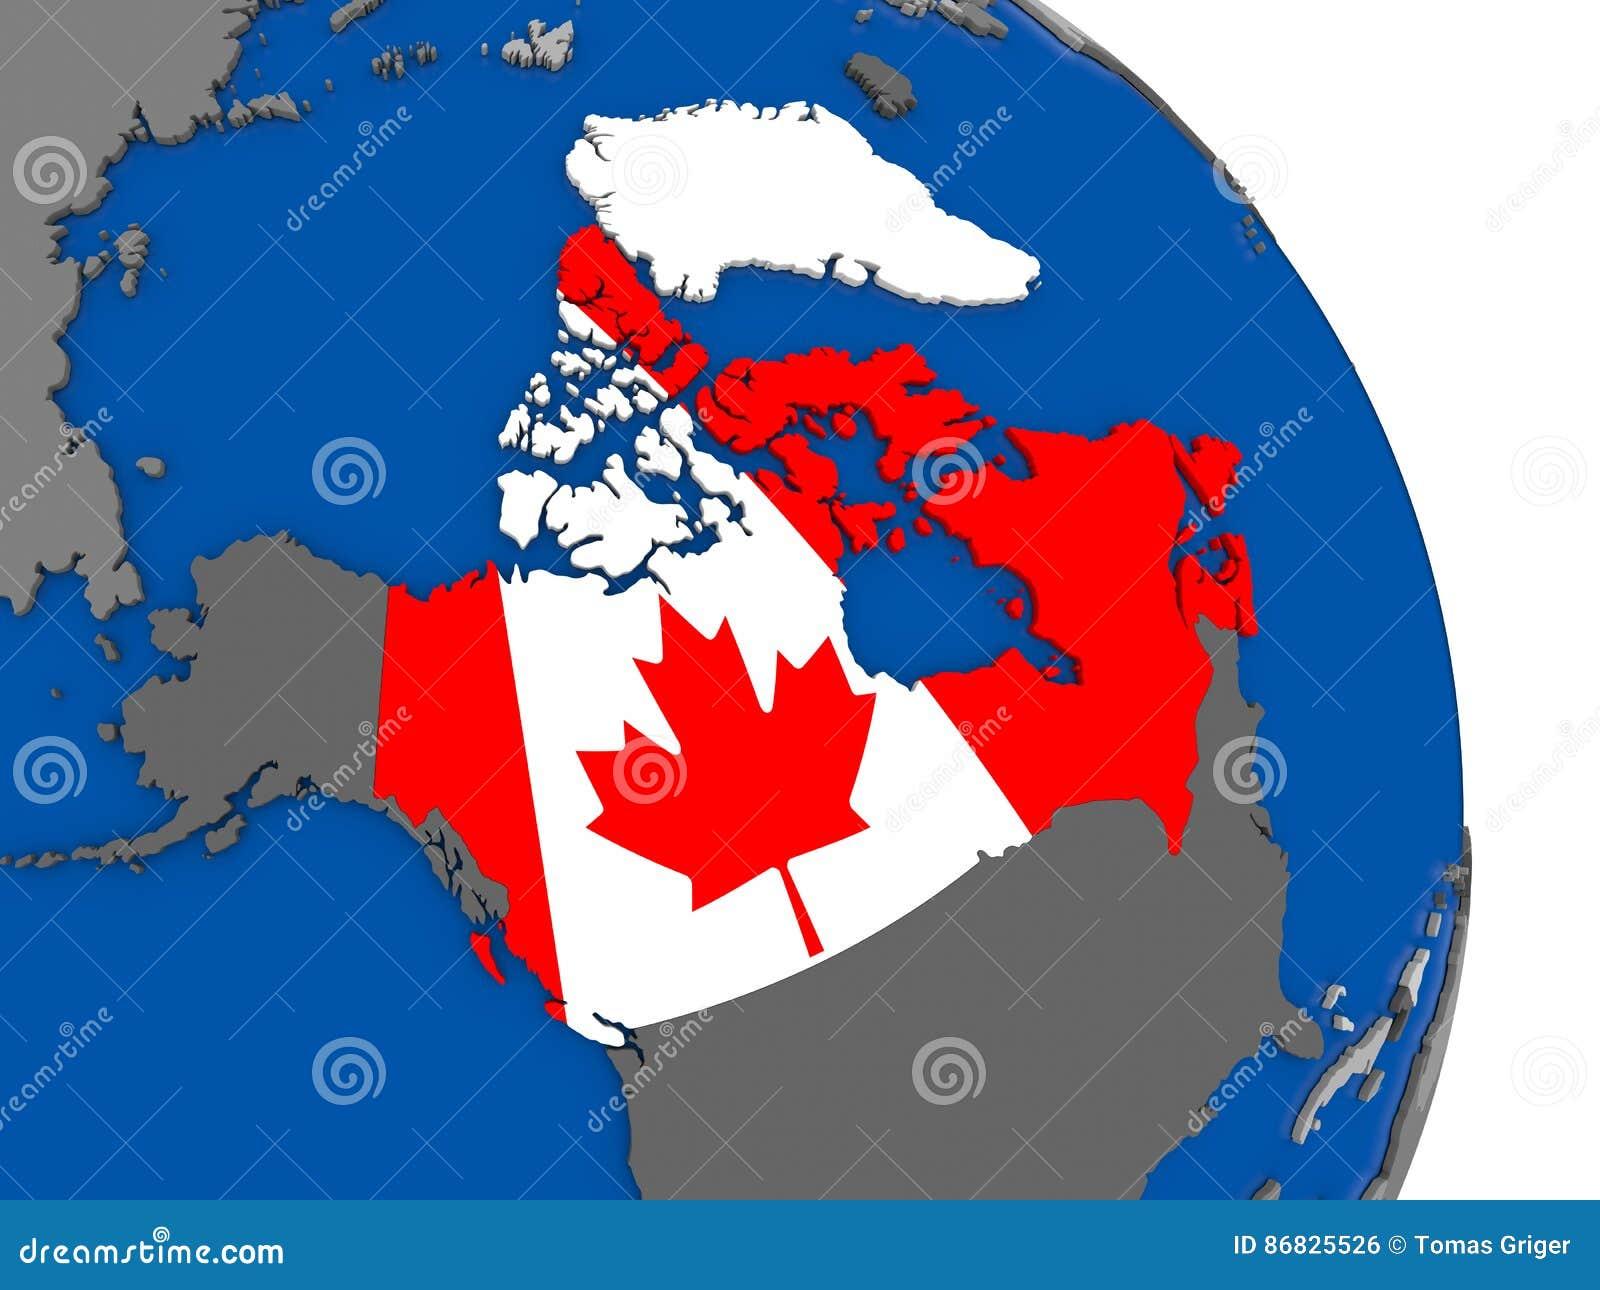 Map Of Canada On Globe.Canada And Its Flag On Globe Stock Illustration Illustration Of